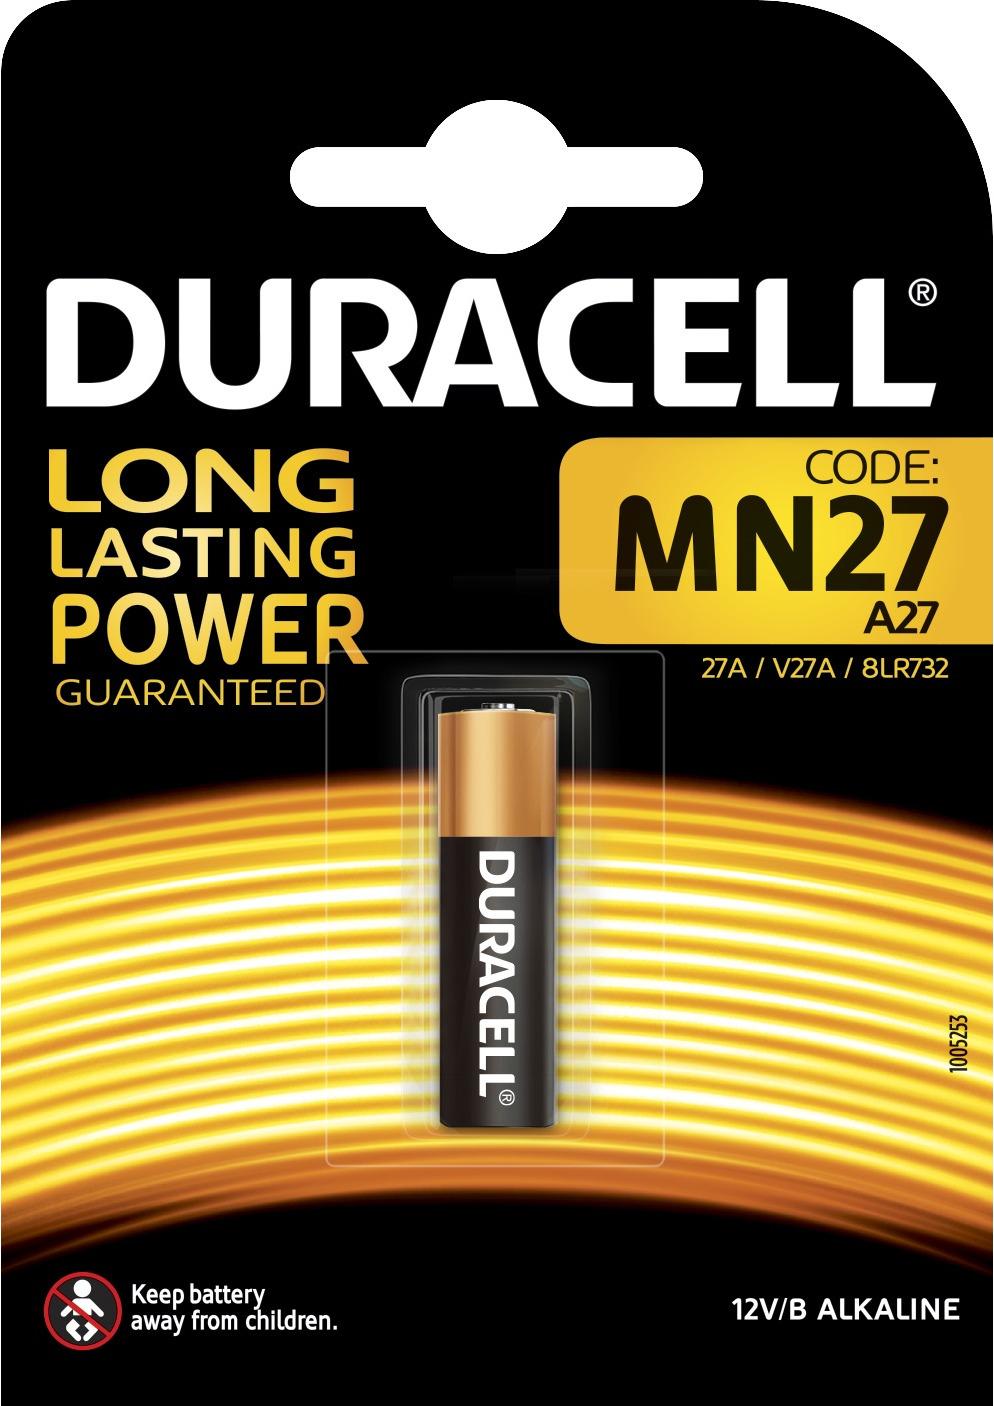 Батарейка алкалиновая Duracell, типоразмер MN27, 12 В цена